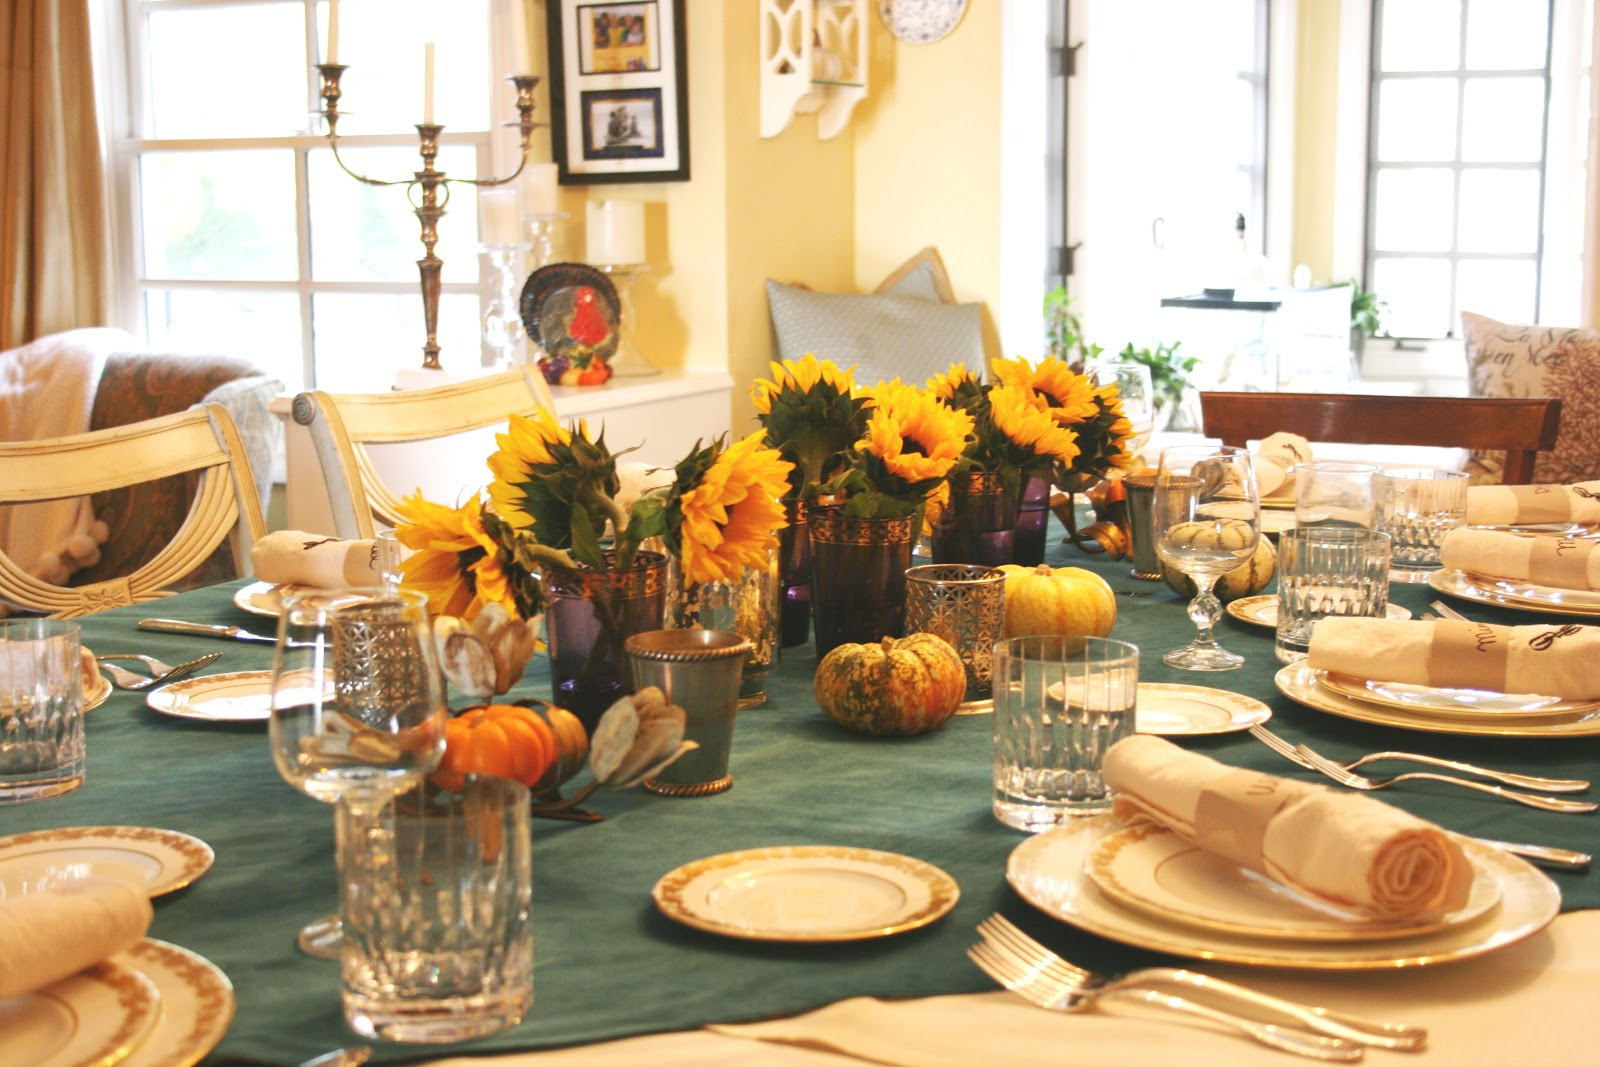 Thanksgiving table decoration ideas interior design